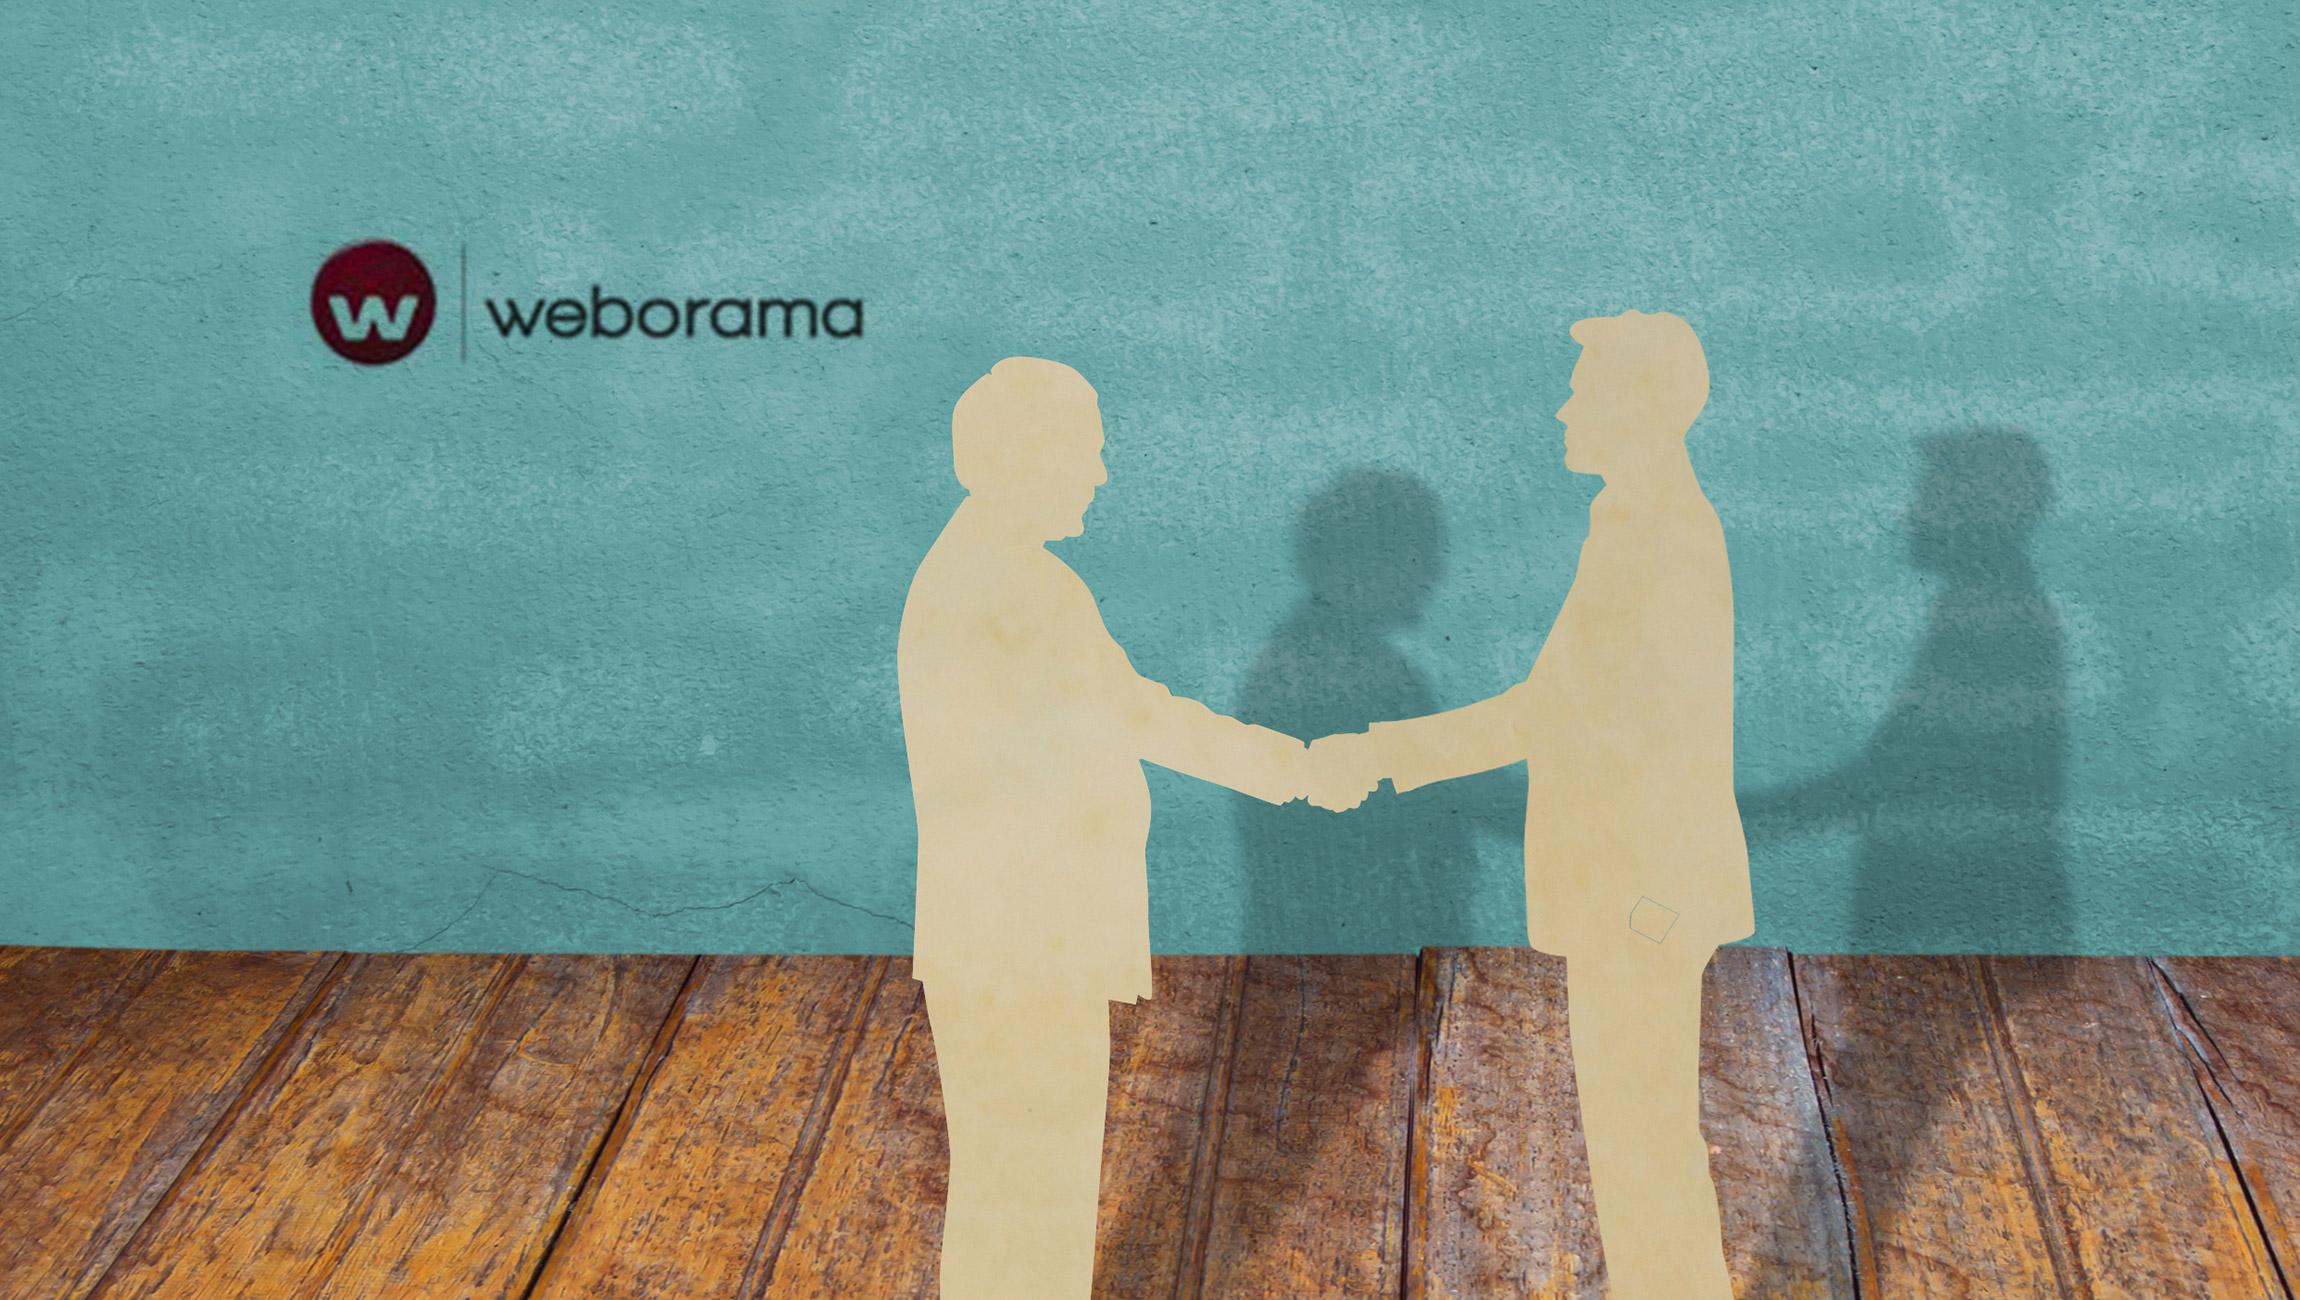 Weborama's Parent Company Tops Amazon's Bid to Acquire Sizmek Ad Server and DCO